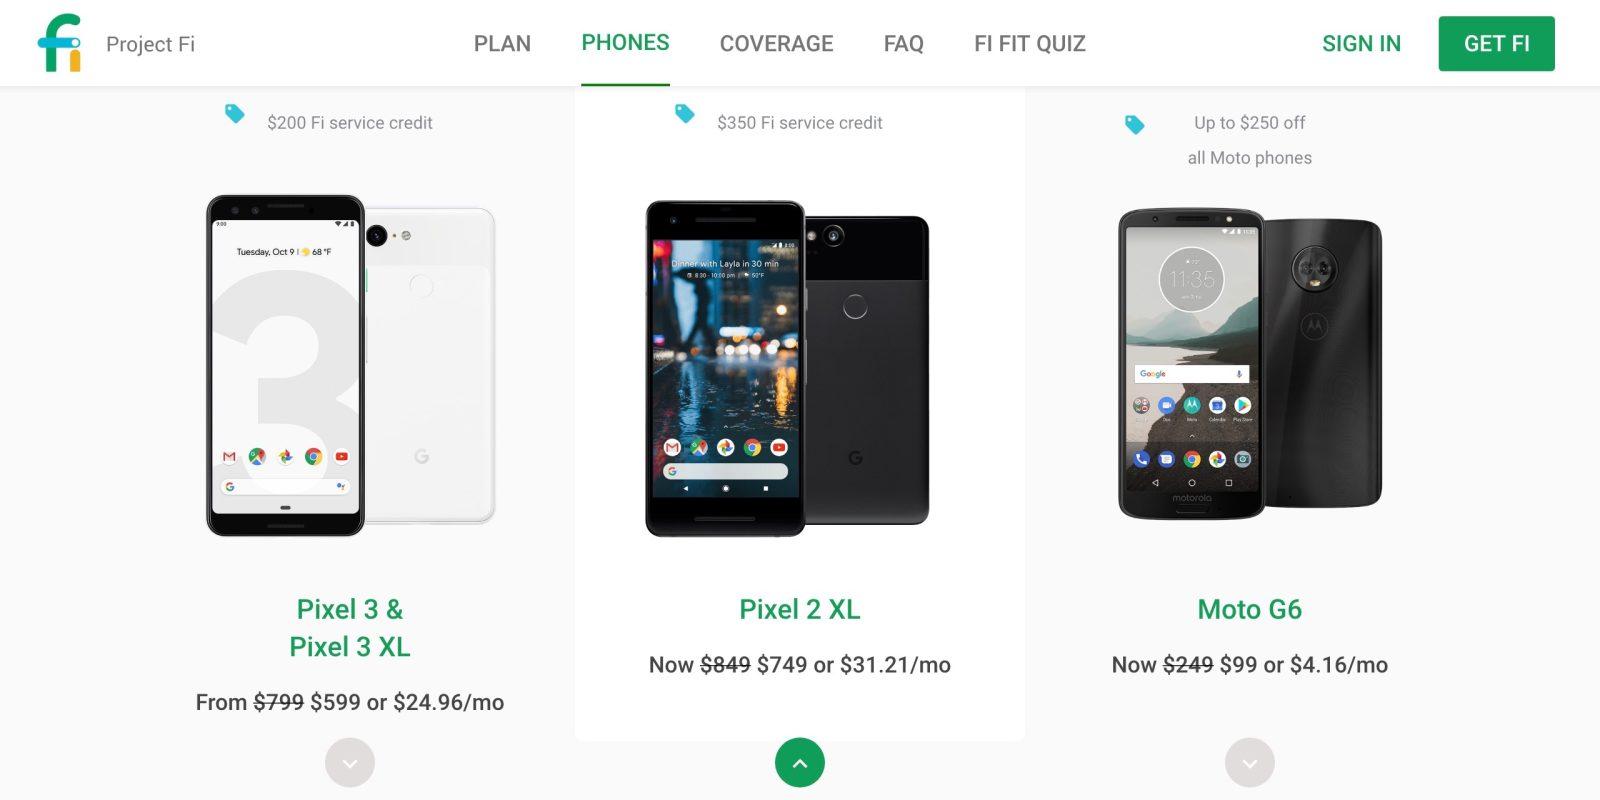 Project Fi Black Friday: $200 off Pixel 3, 3 XL + $200